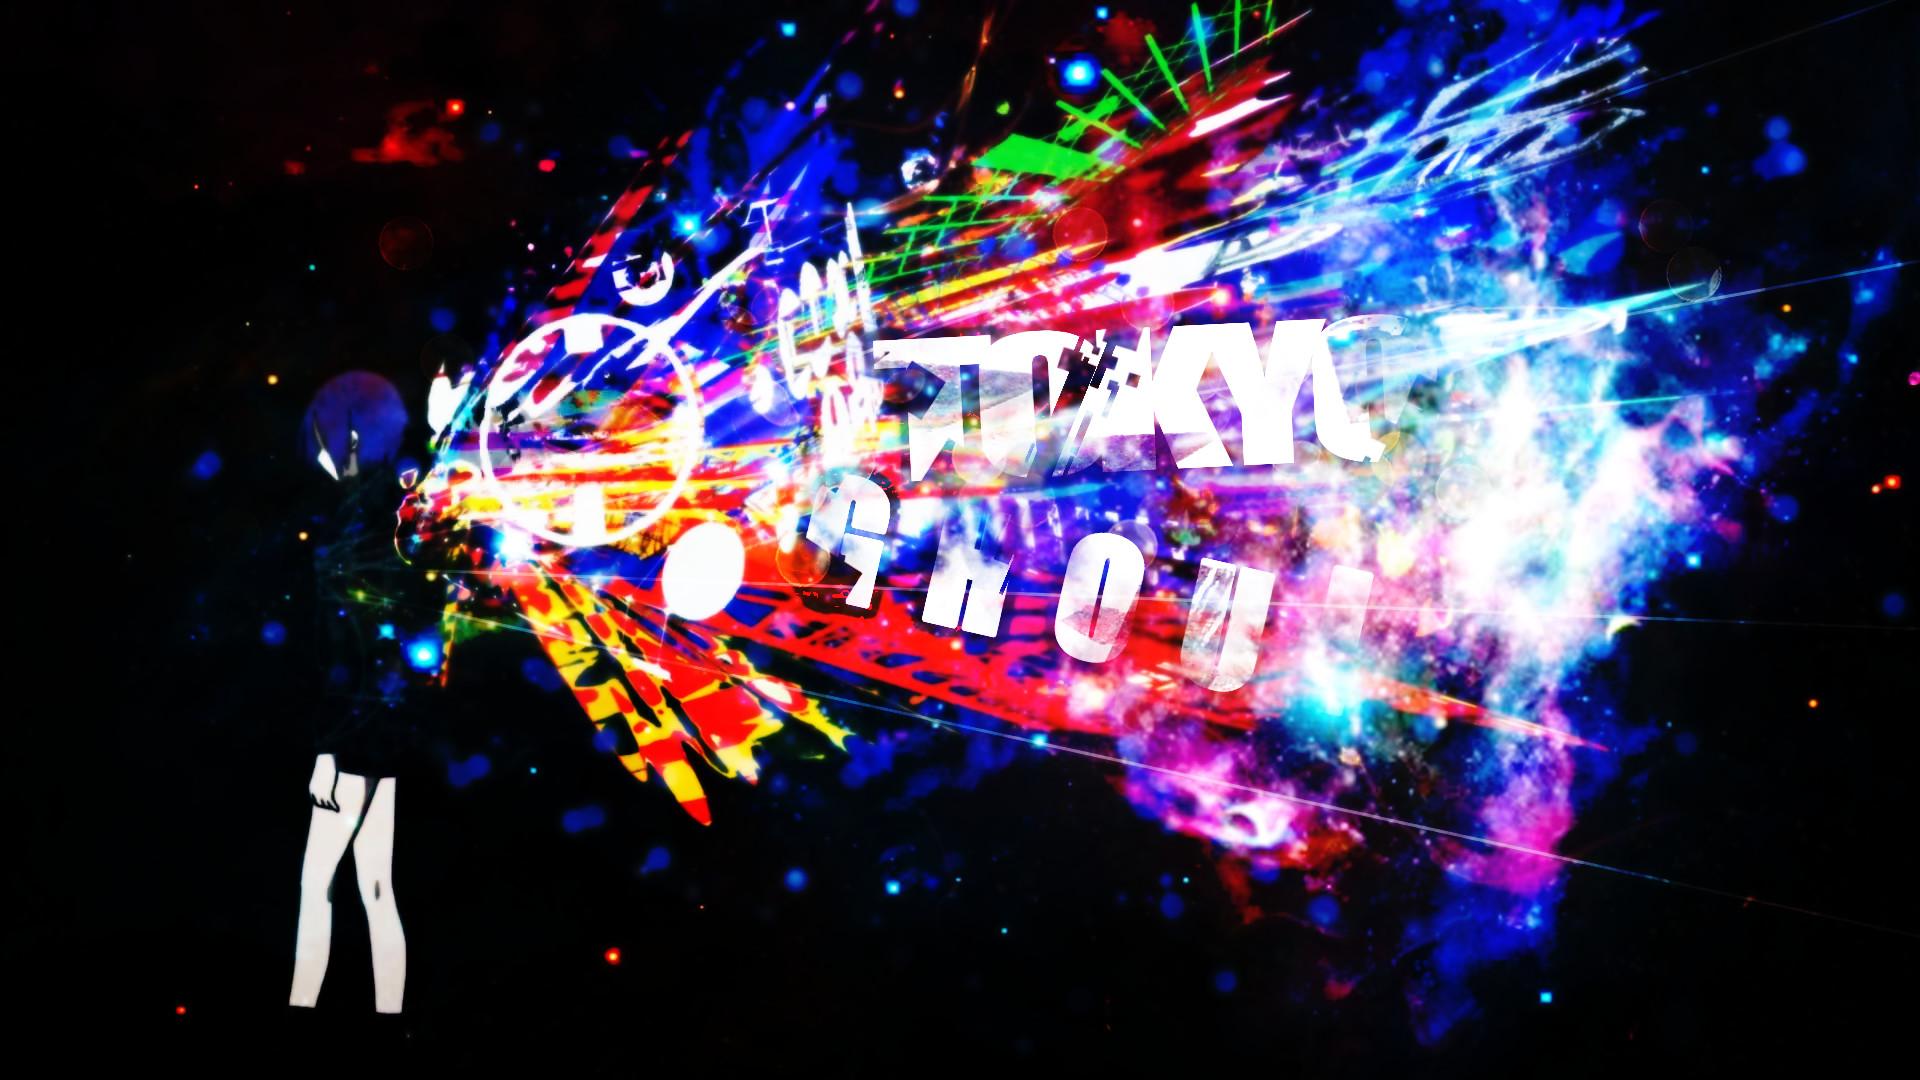 Tokyo Ghoul WP by Everay Tokyo Ghoul WP by Everay